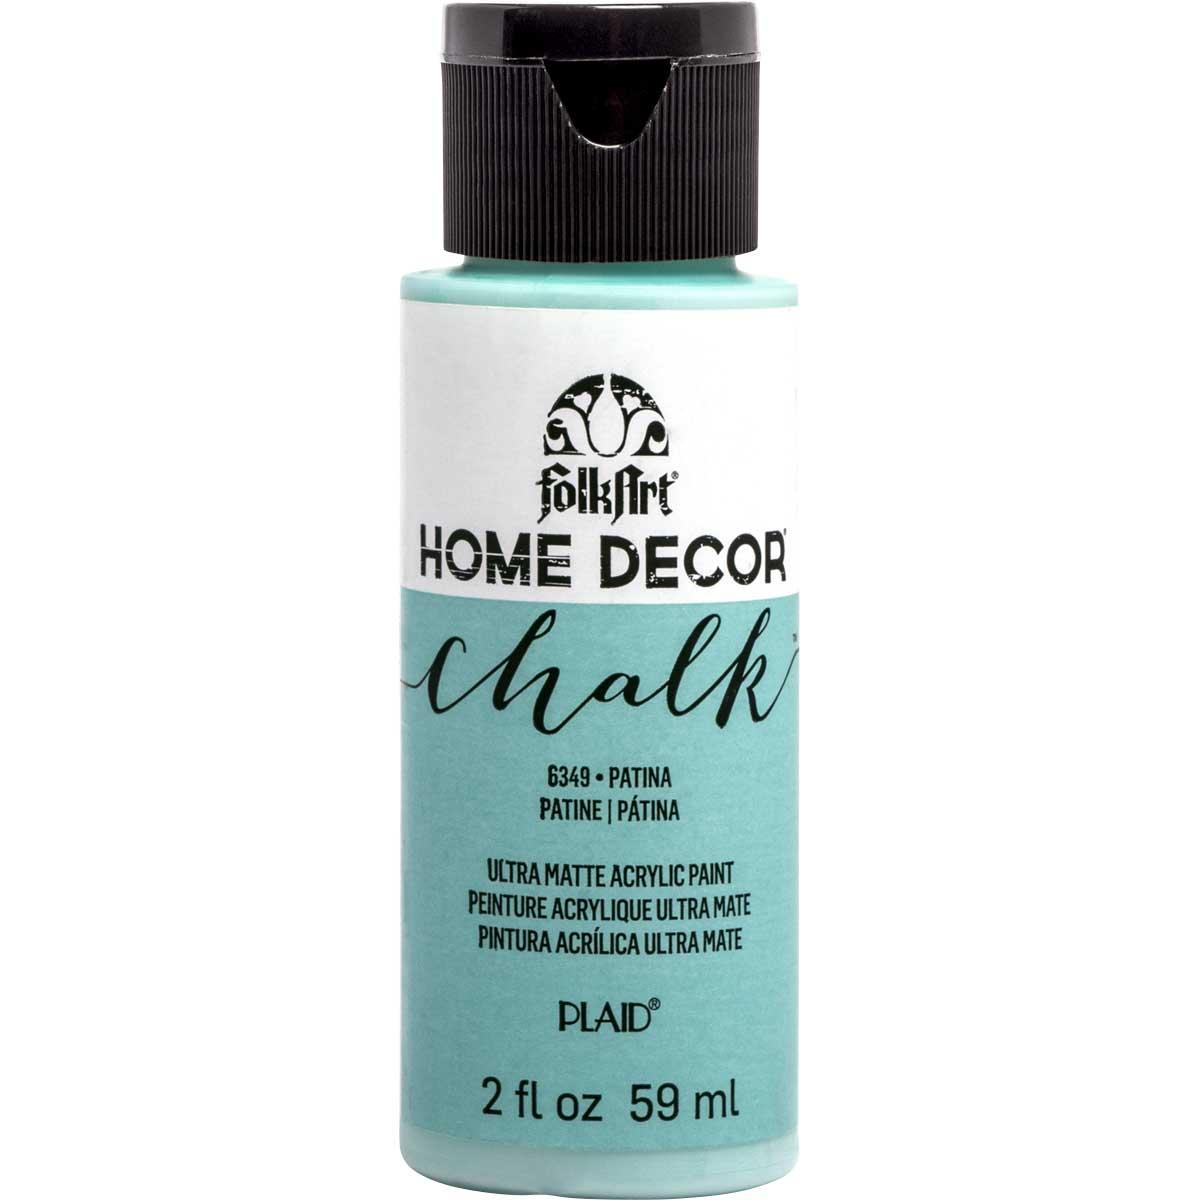 FolkArt ® Home Decor™ Chalk - Patina, 2 oz.